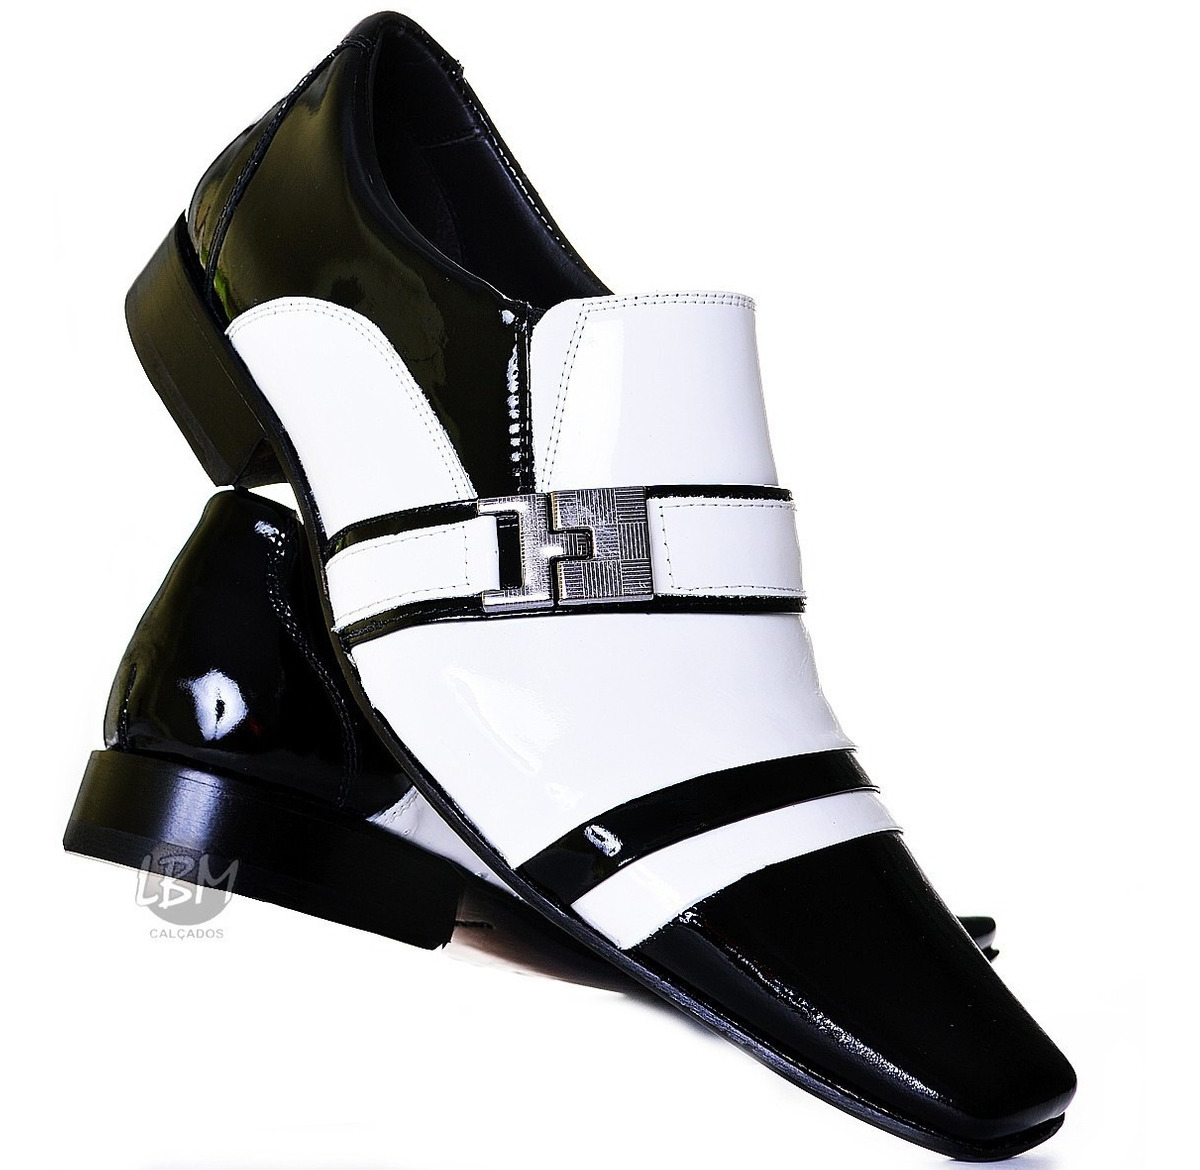 b7b662bcd6 sapato social masculino em couro verniz preto e branco luxo. Carregando  zoom.